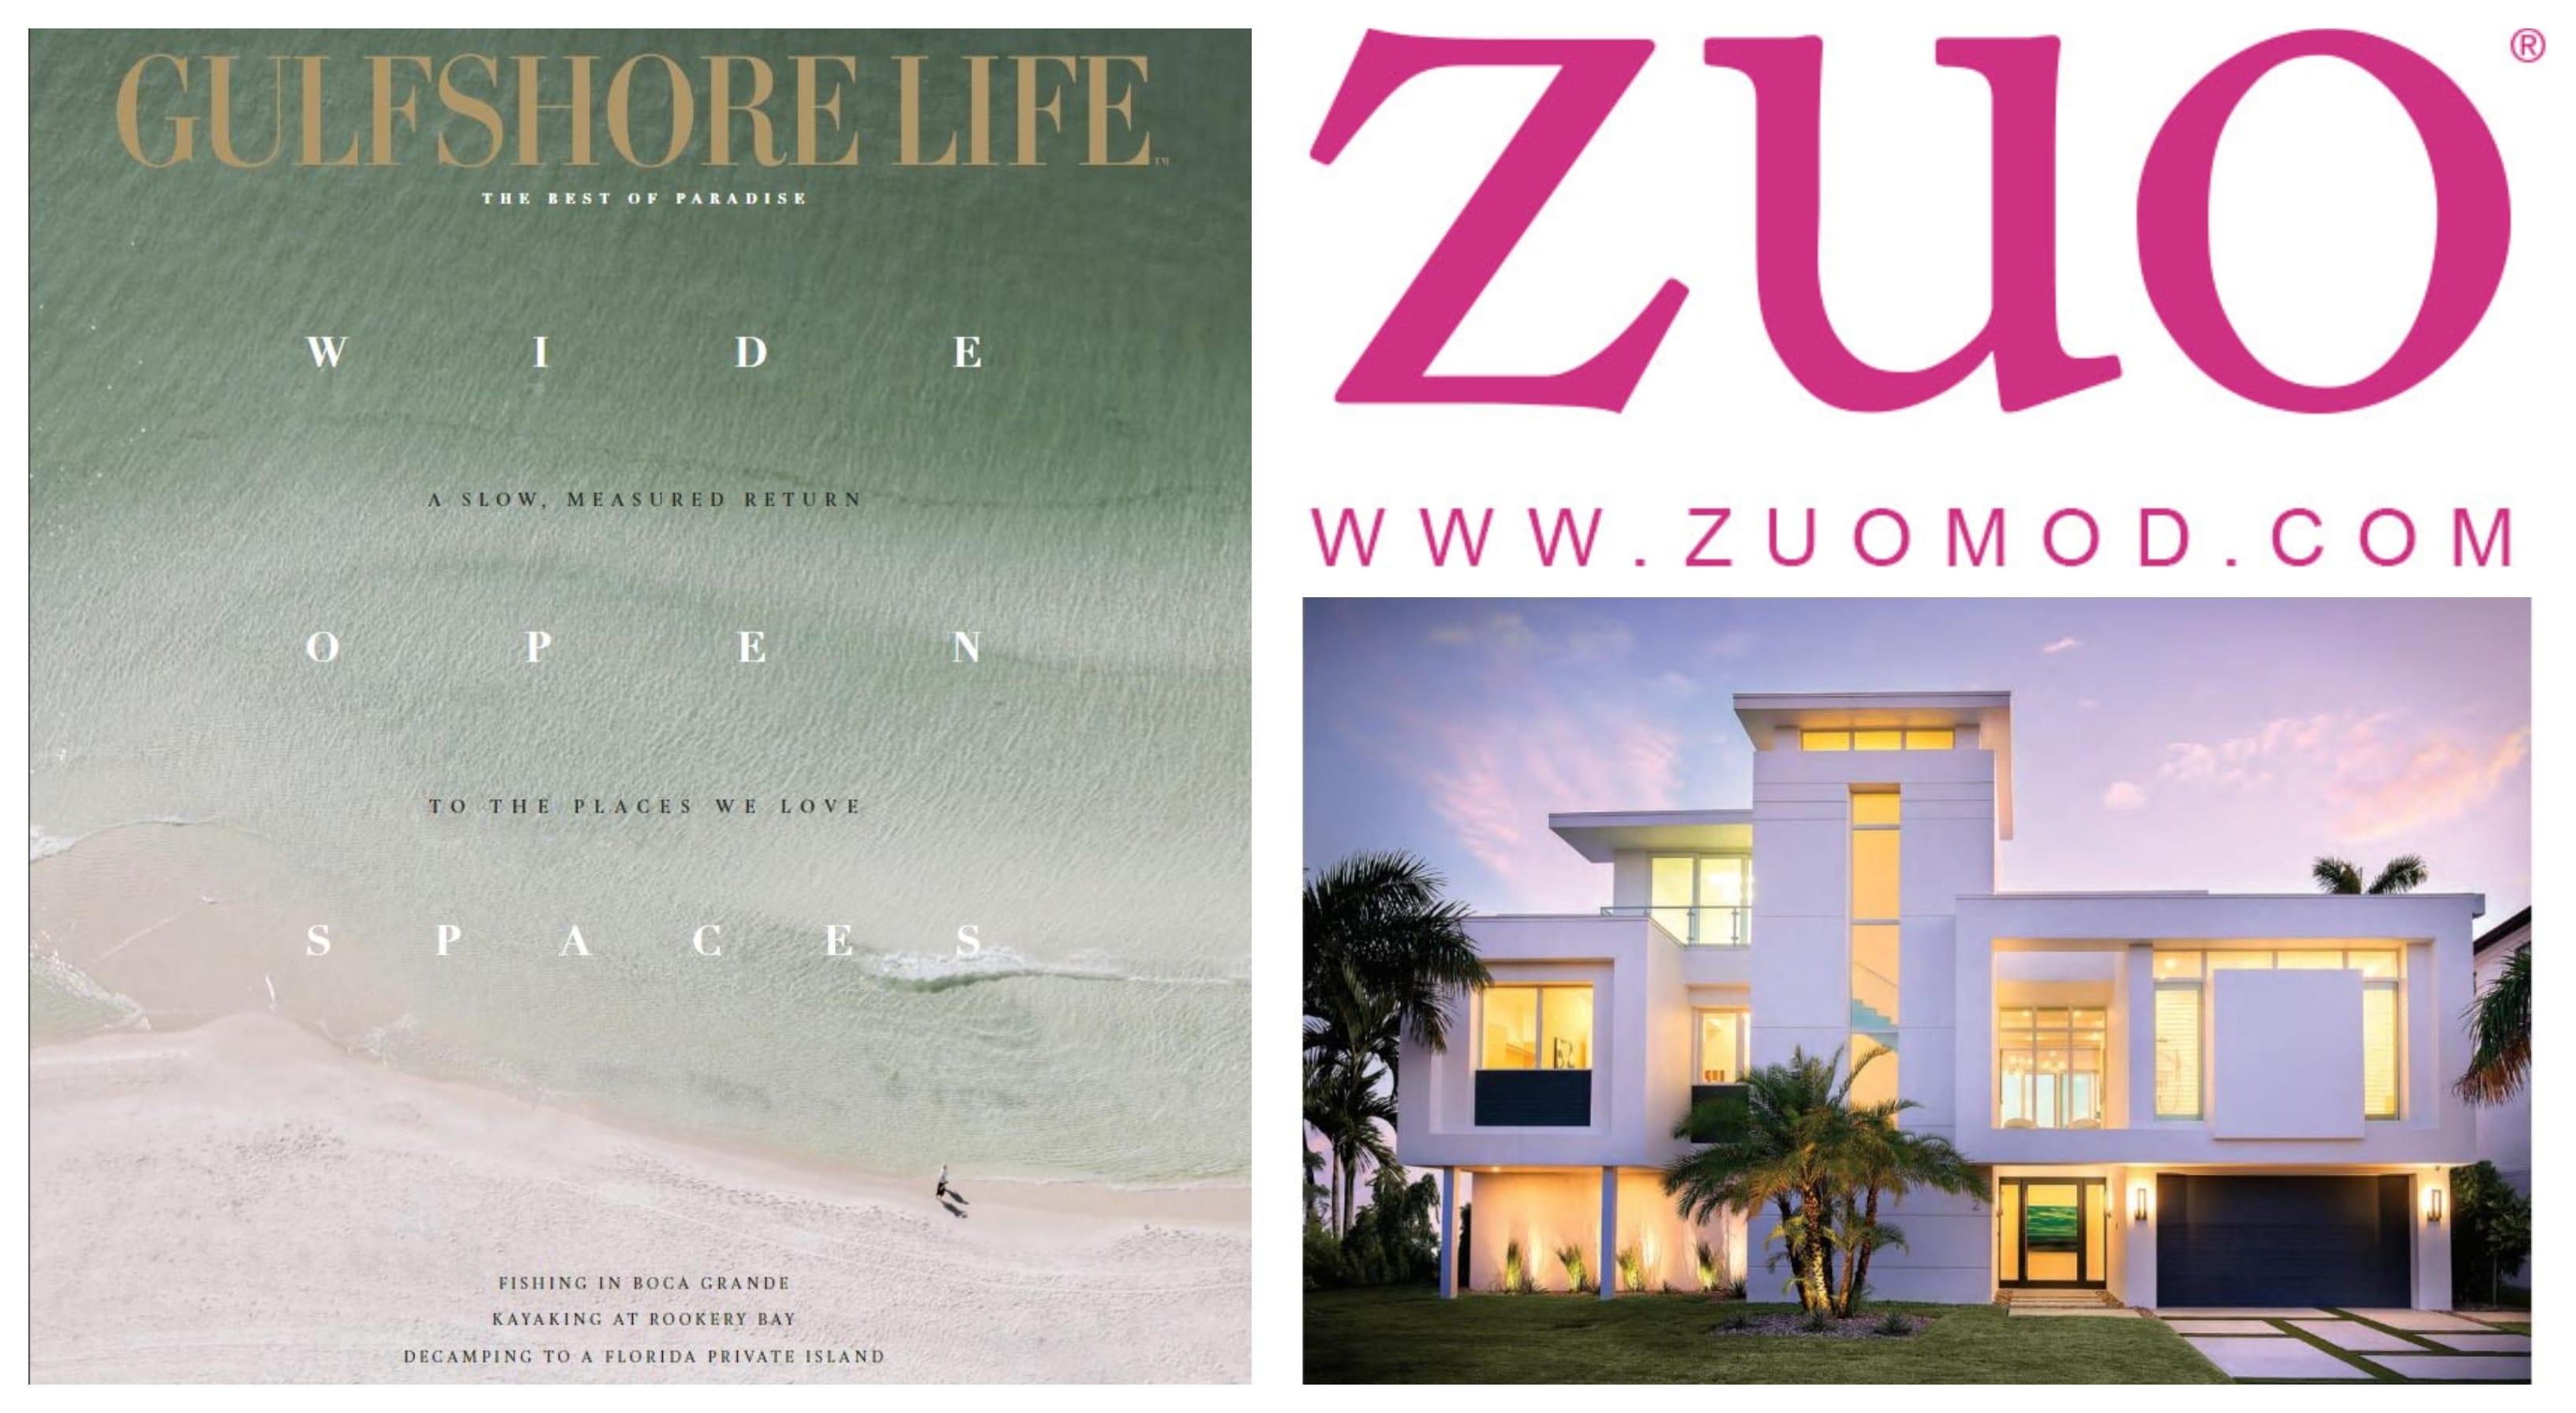 The best of Paradise according to Gulfshore Life Magazine